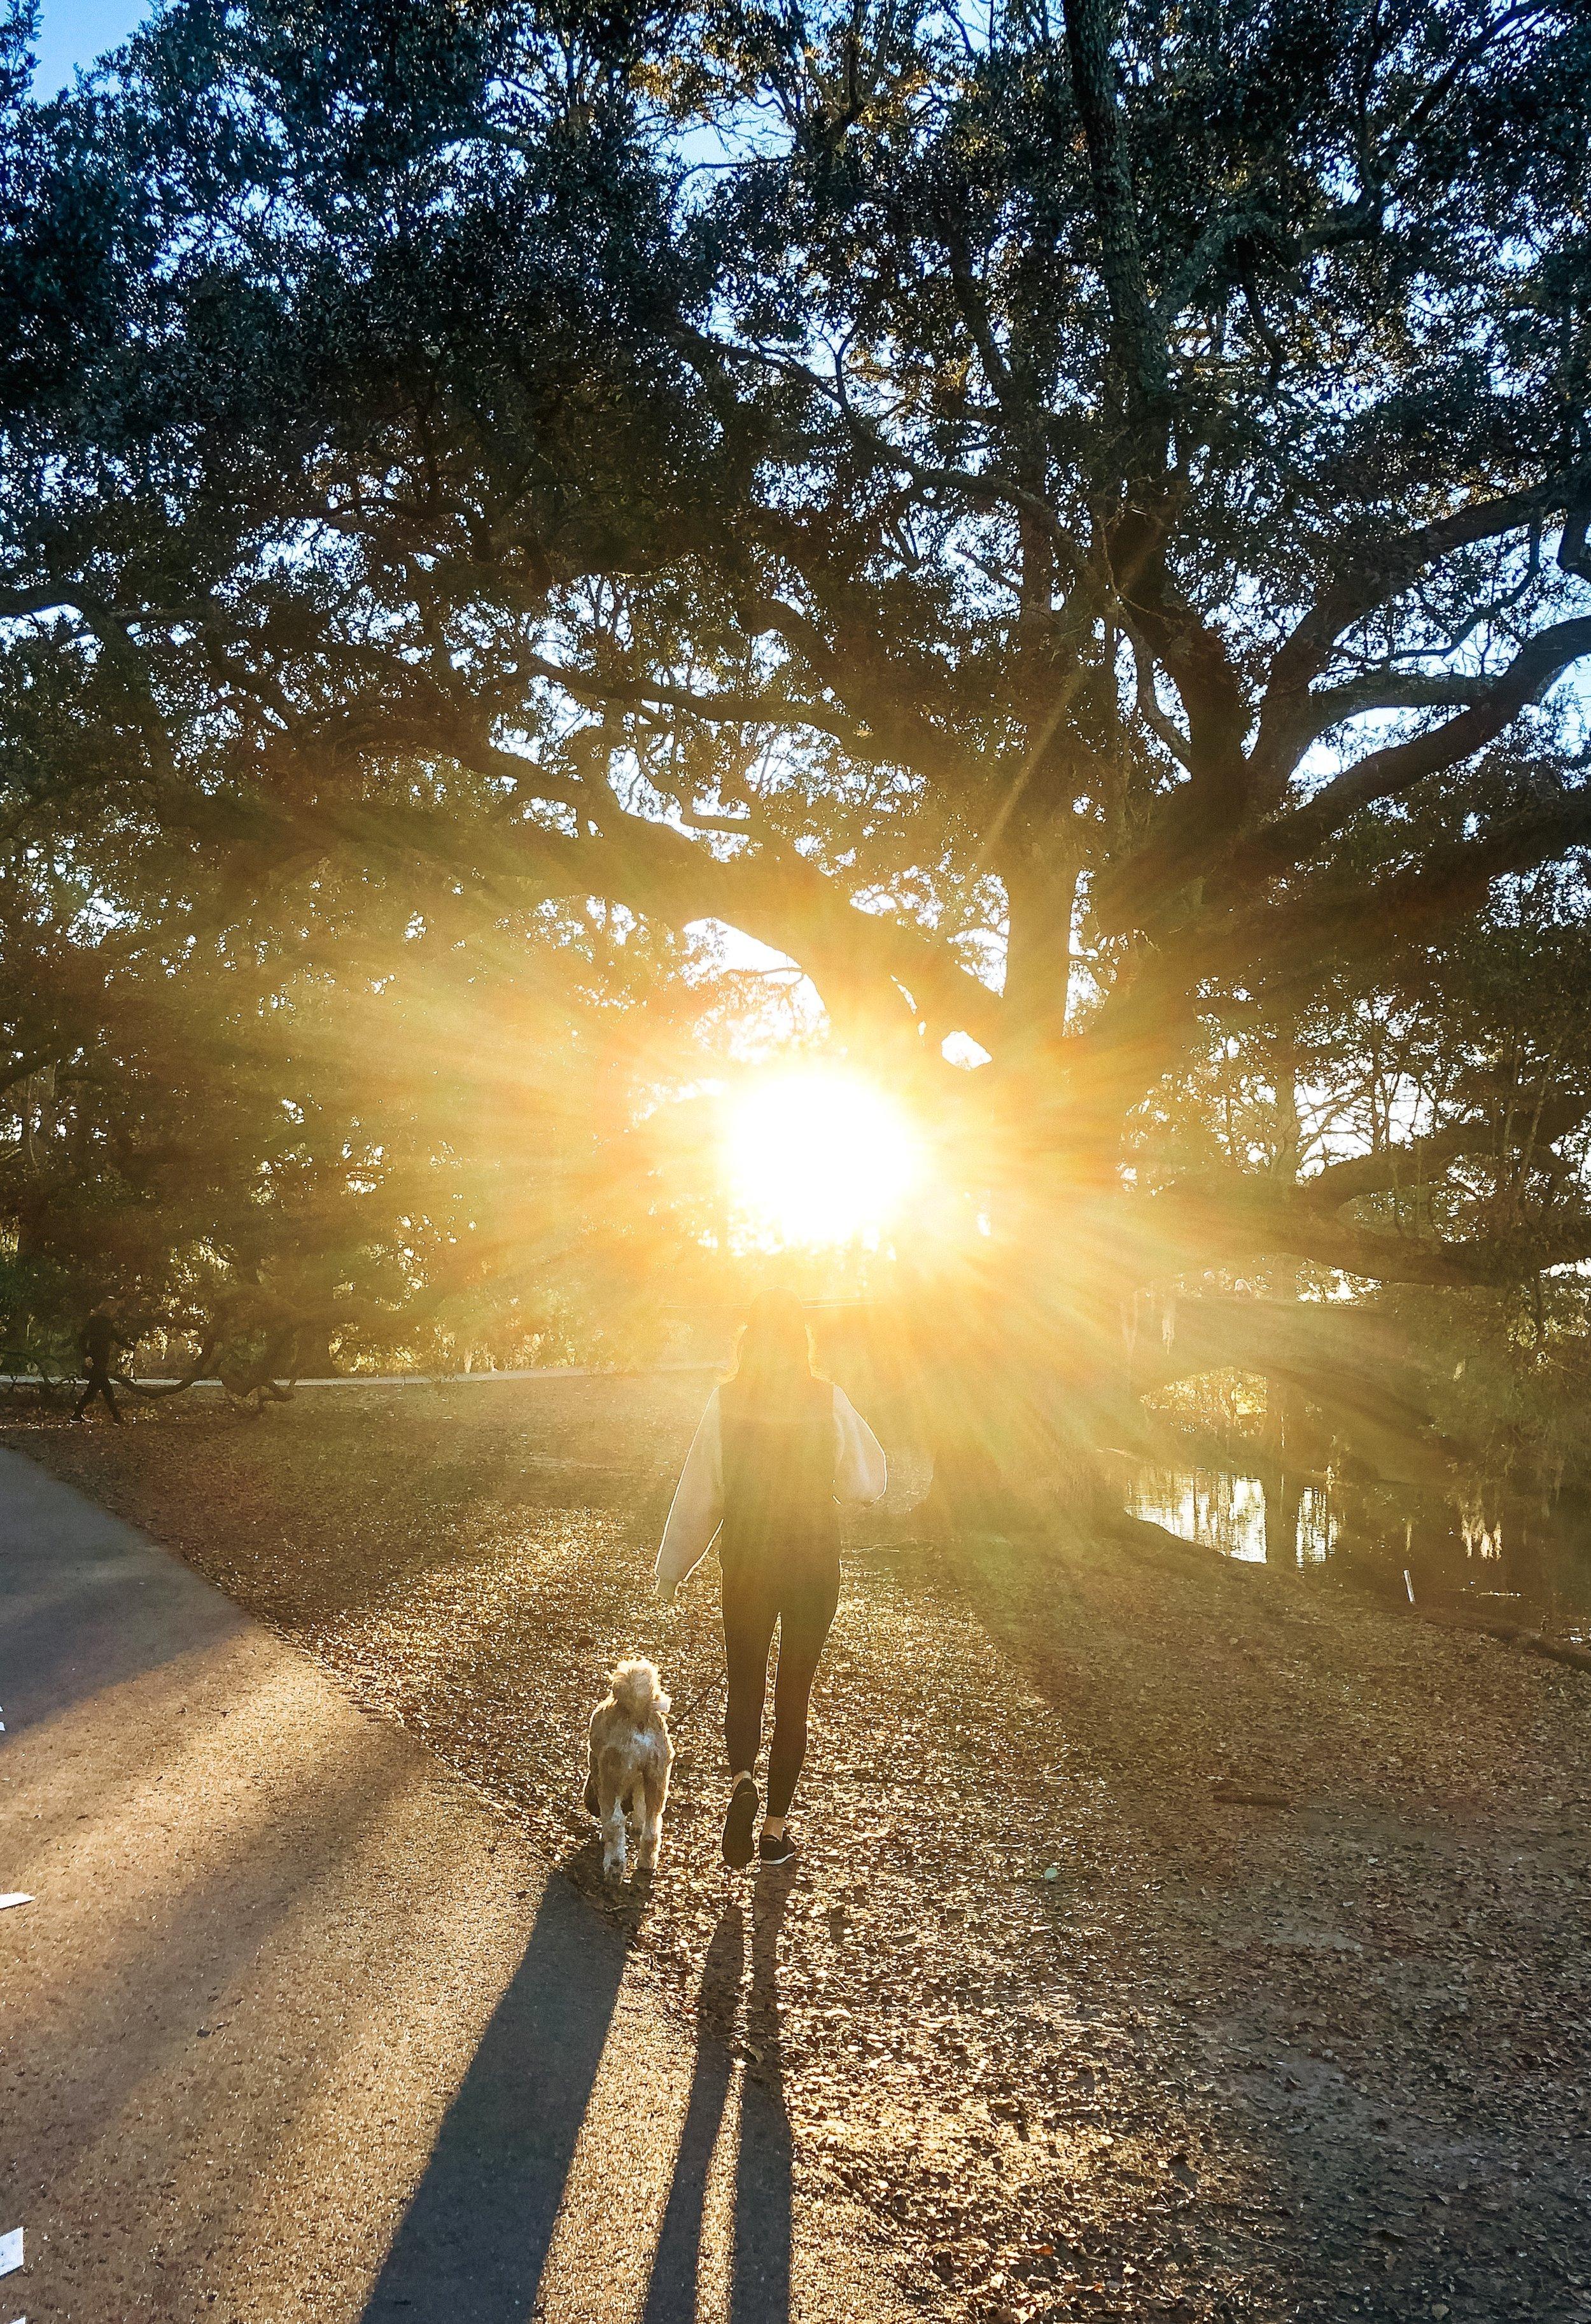 Walking into 2019 like with a hopeful heart and the best doggo I know…